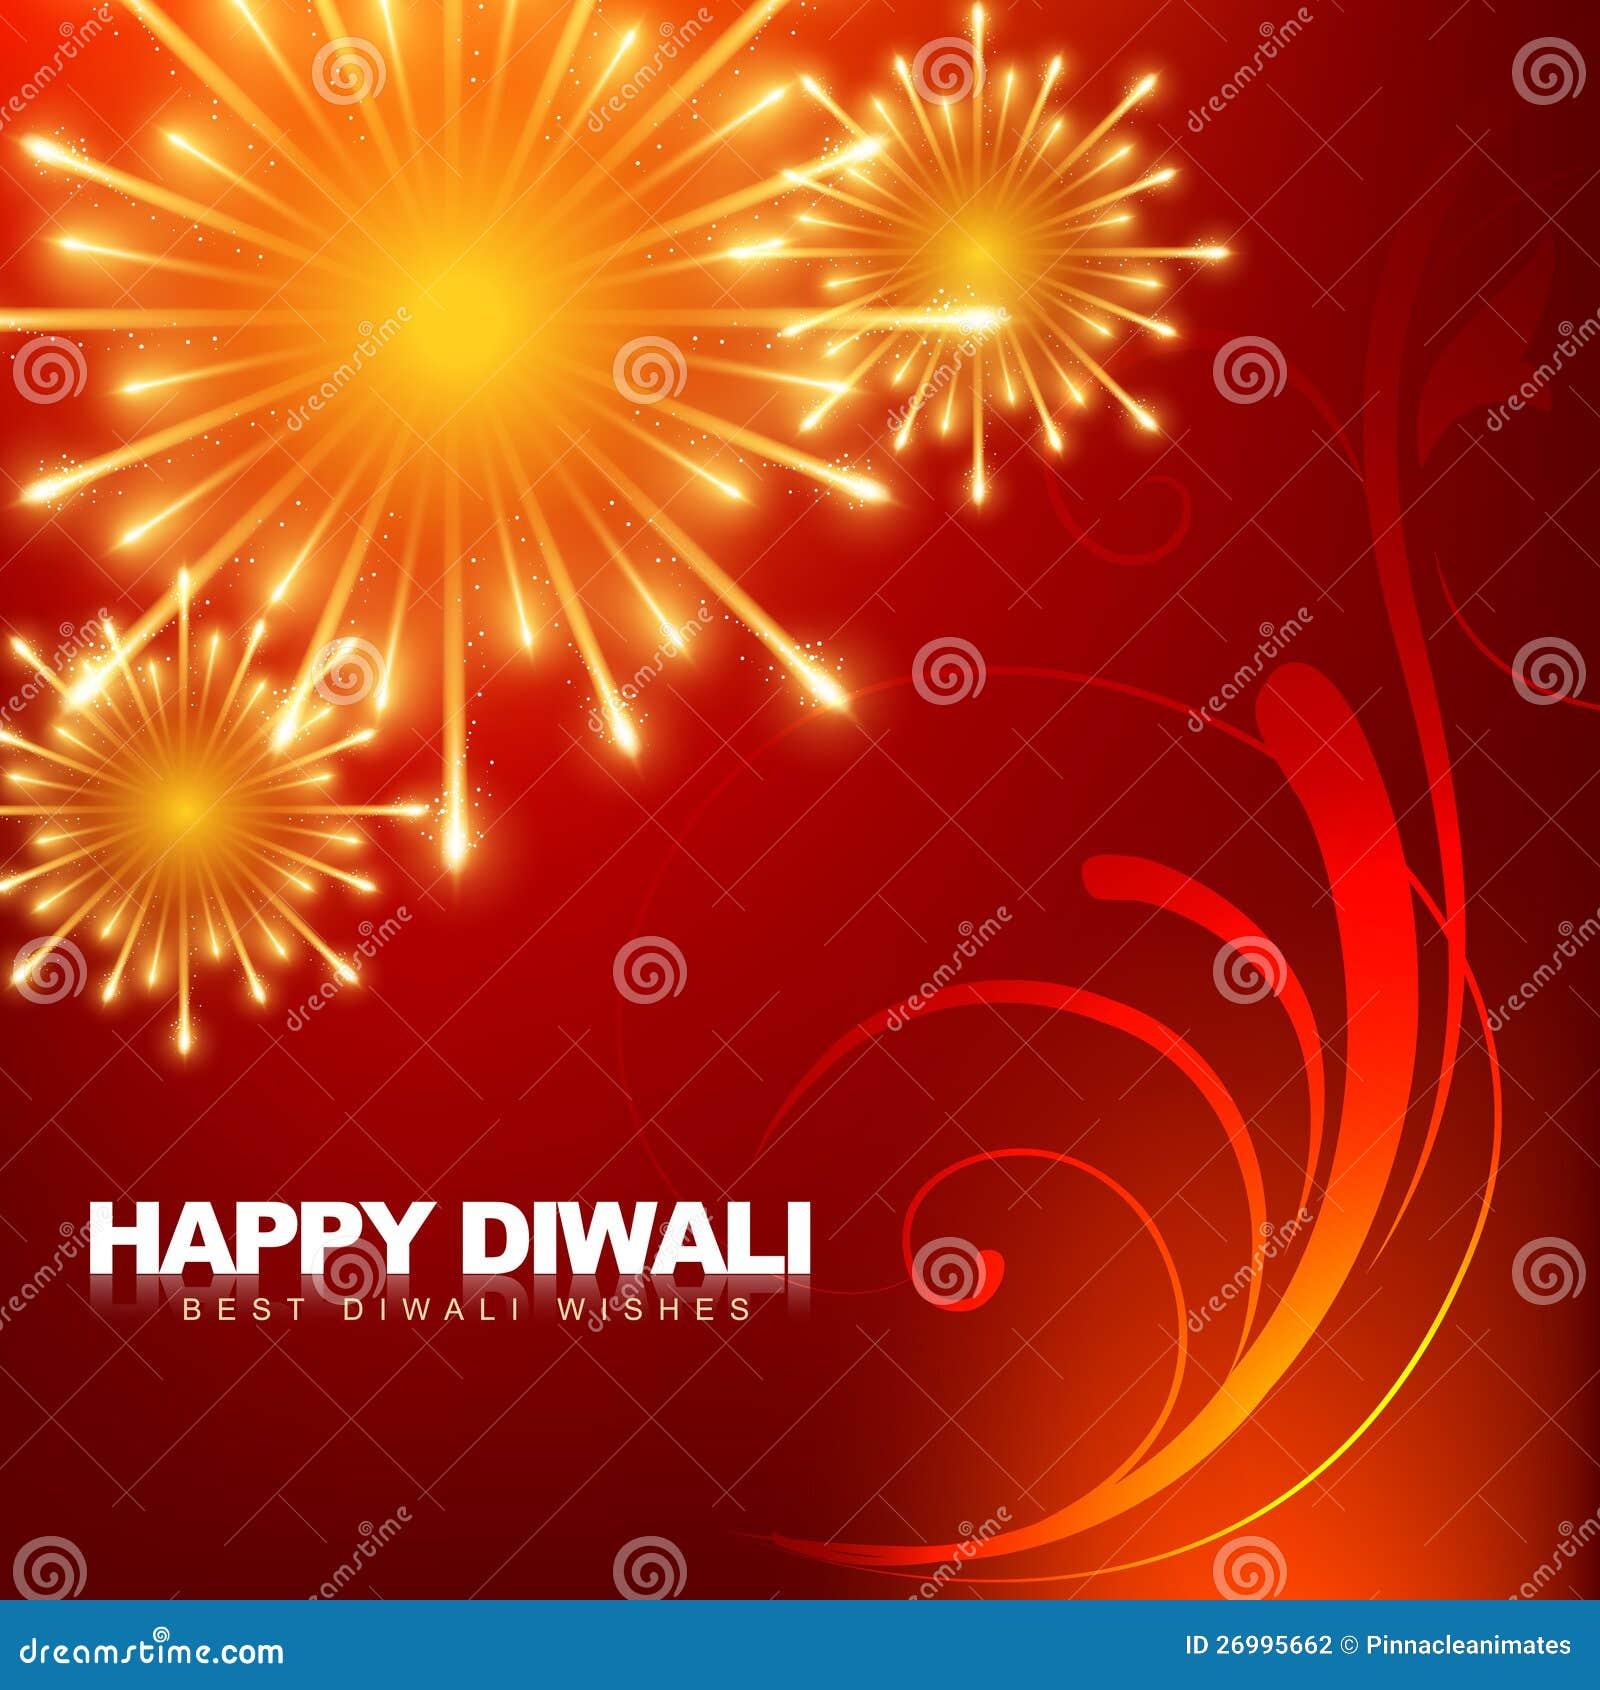 Happy Diwali Fireworks Stock Photography - Image: 26995662